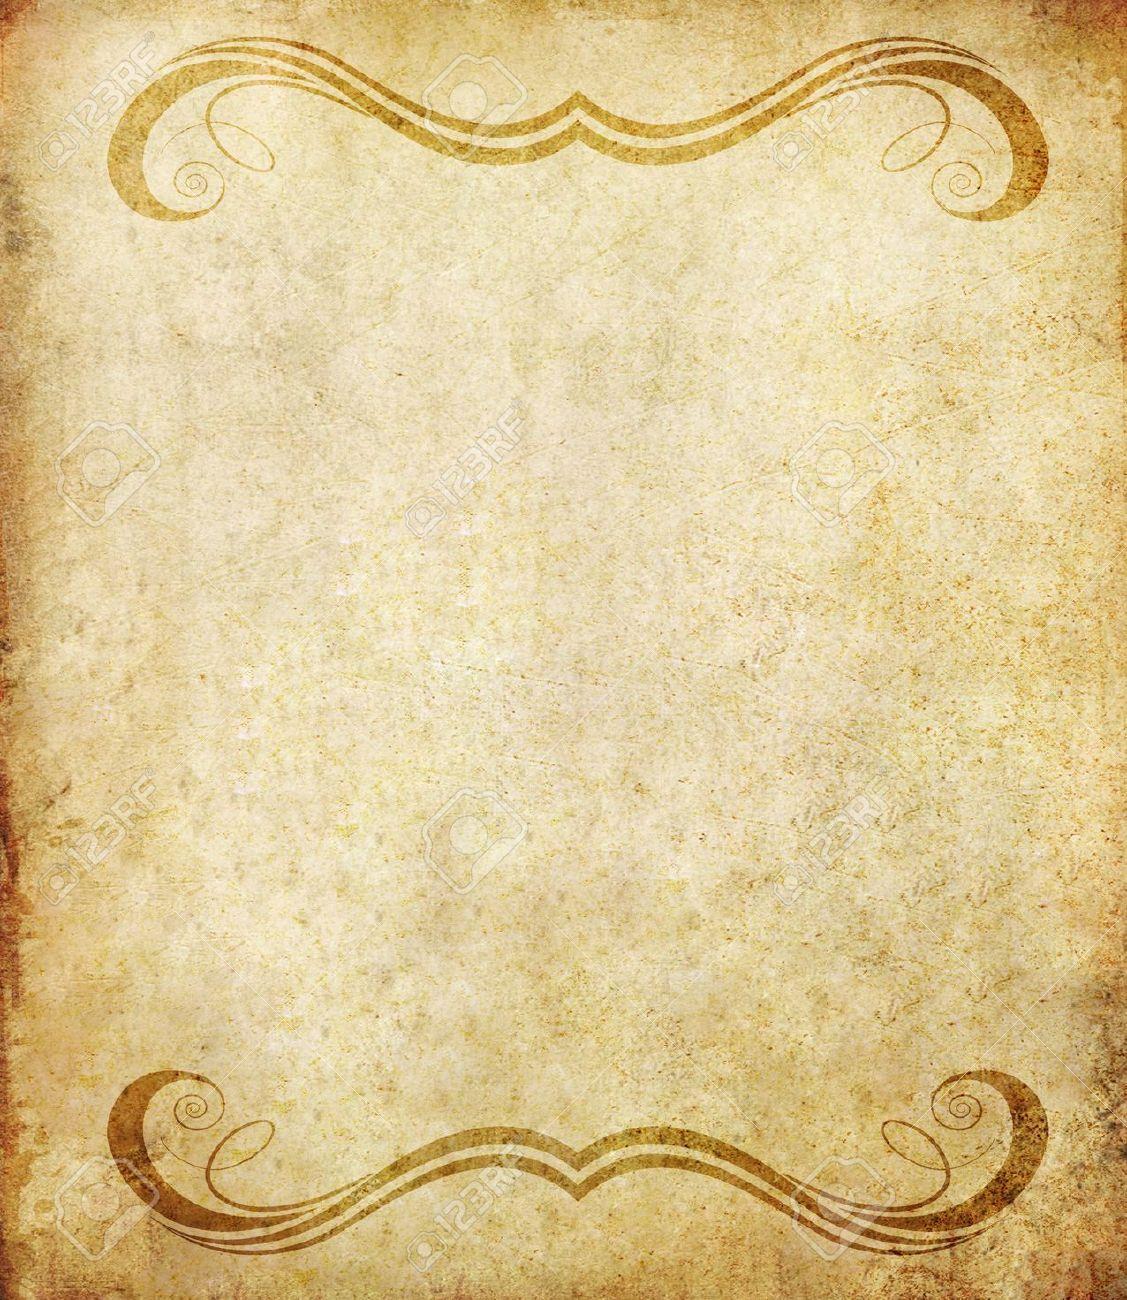 Old Notebook Paper Background Old Grunge Paper Background